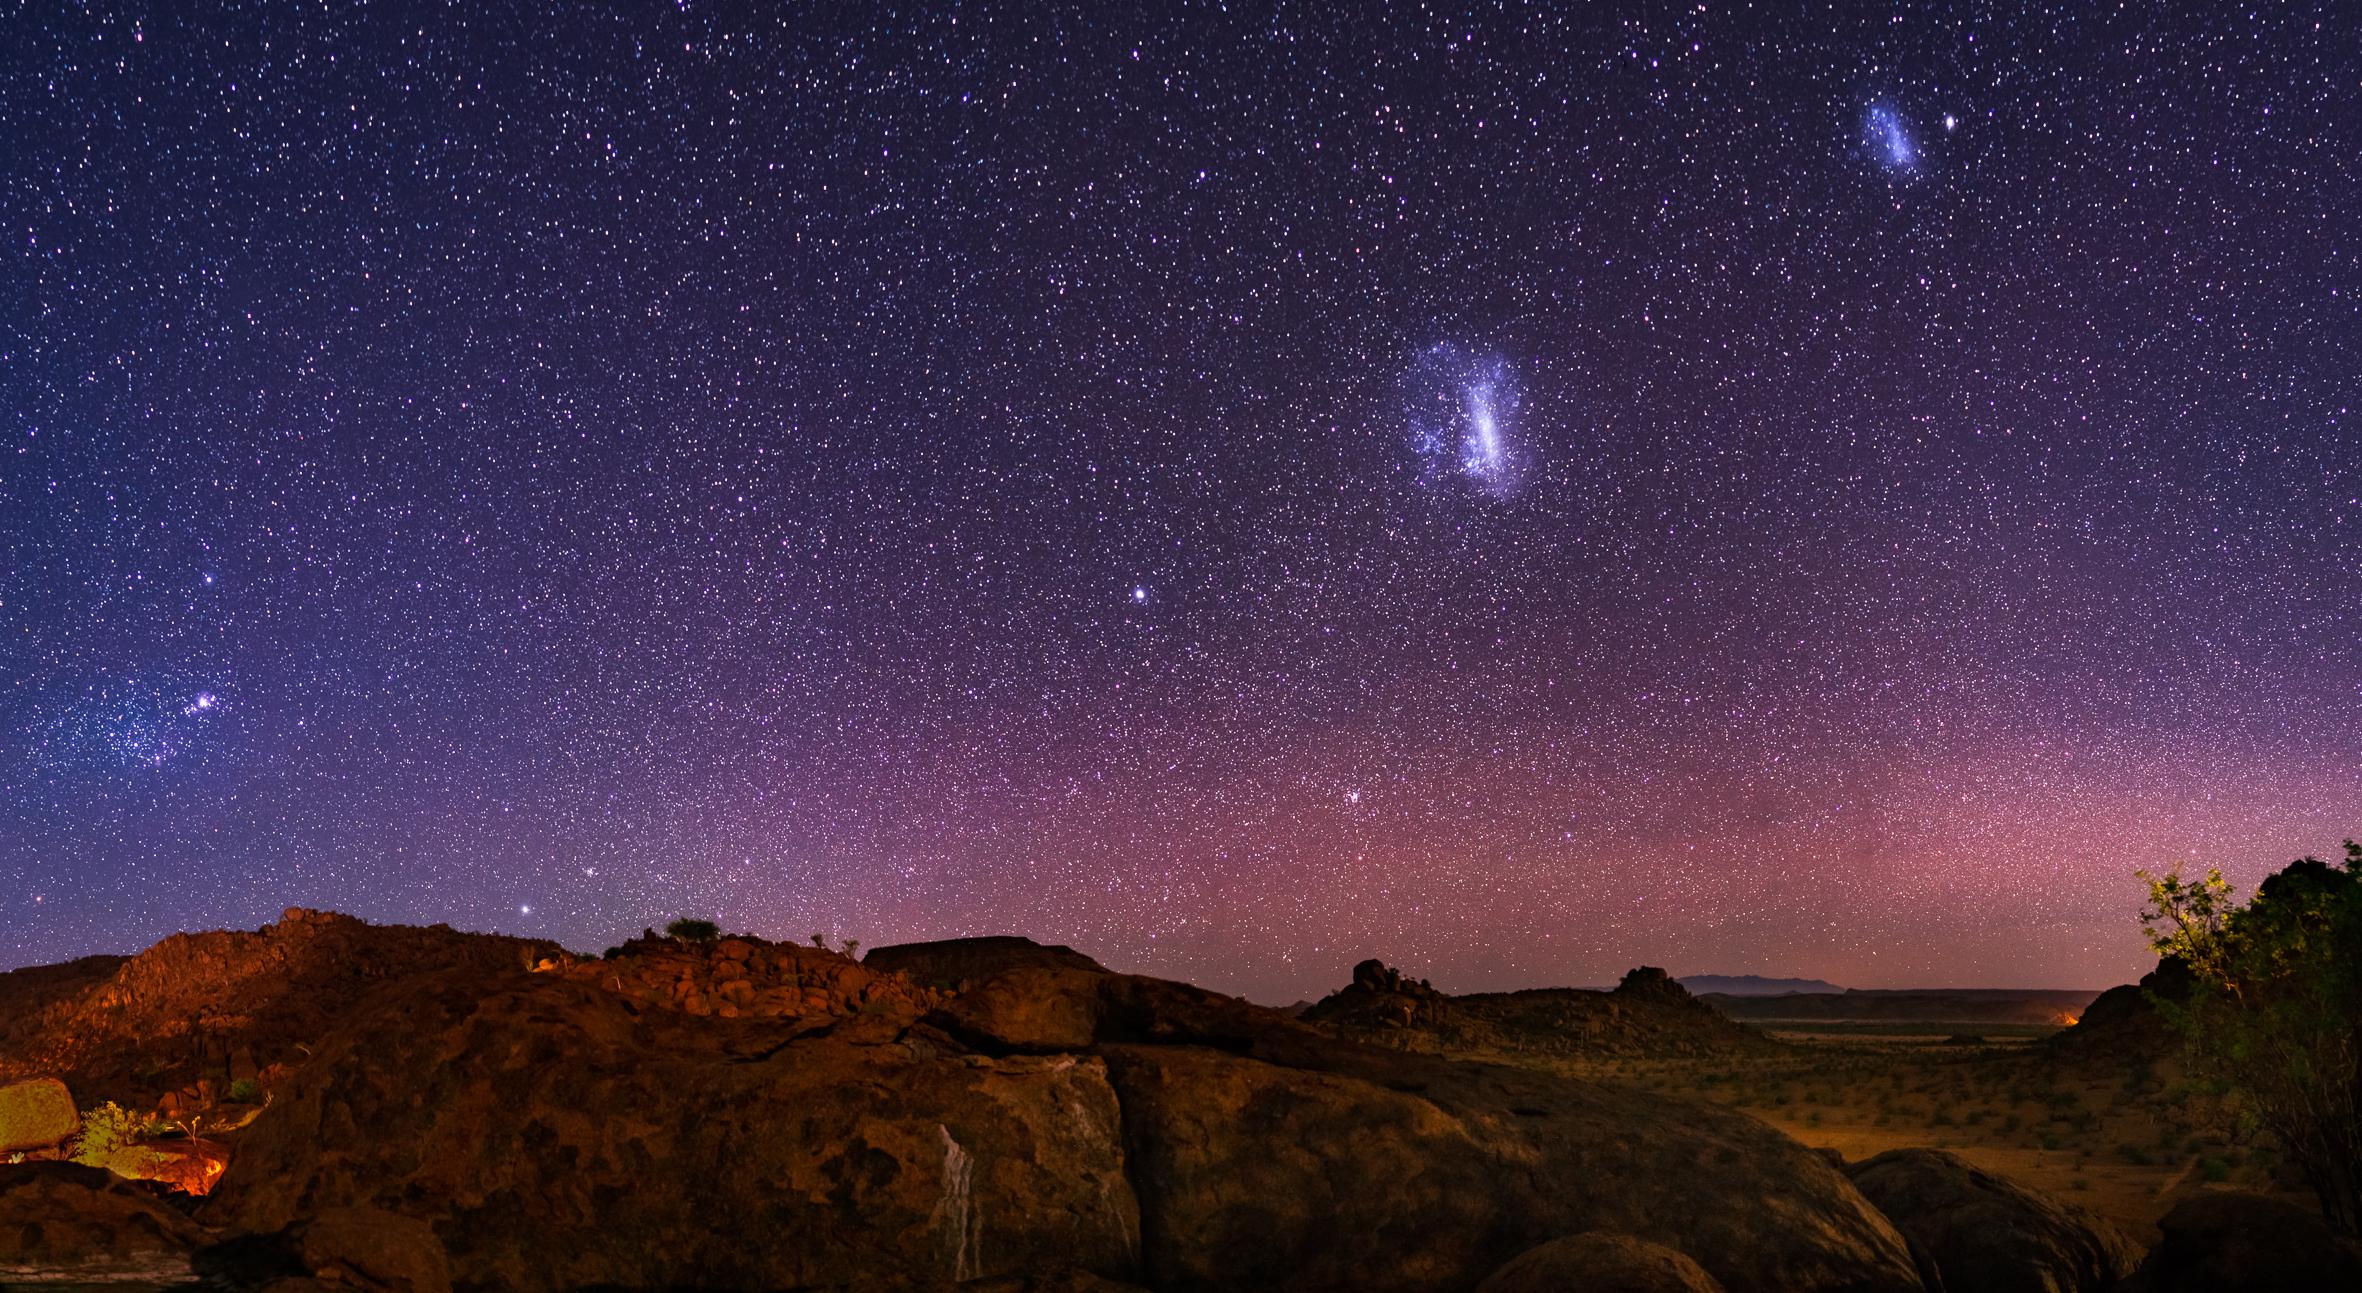 A_Heinrichs_Namibia_Median Panorama_02.jpg